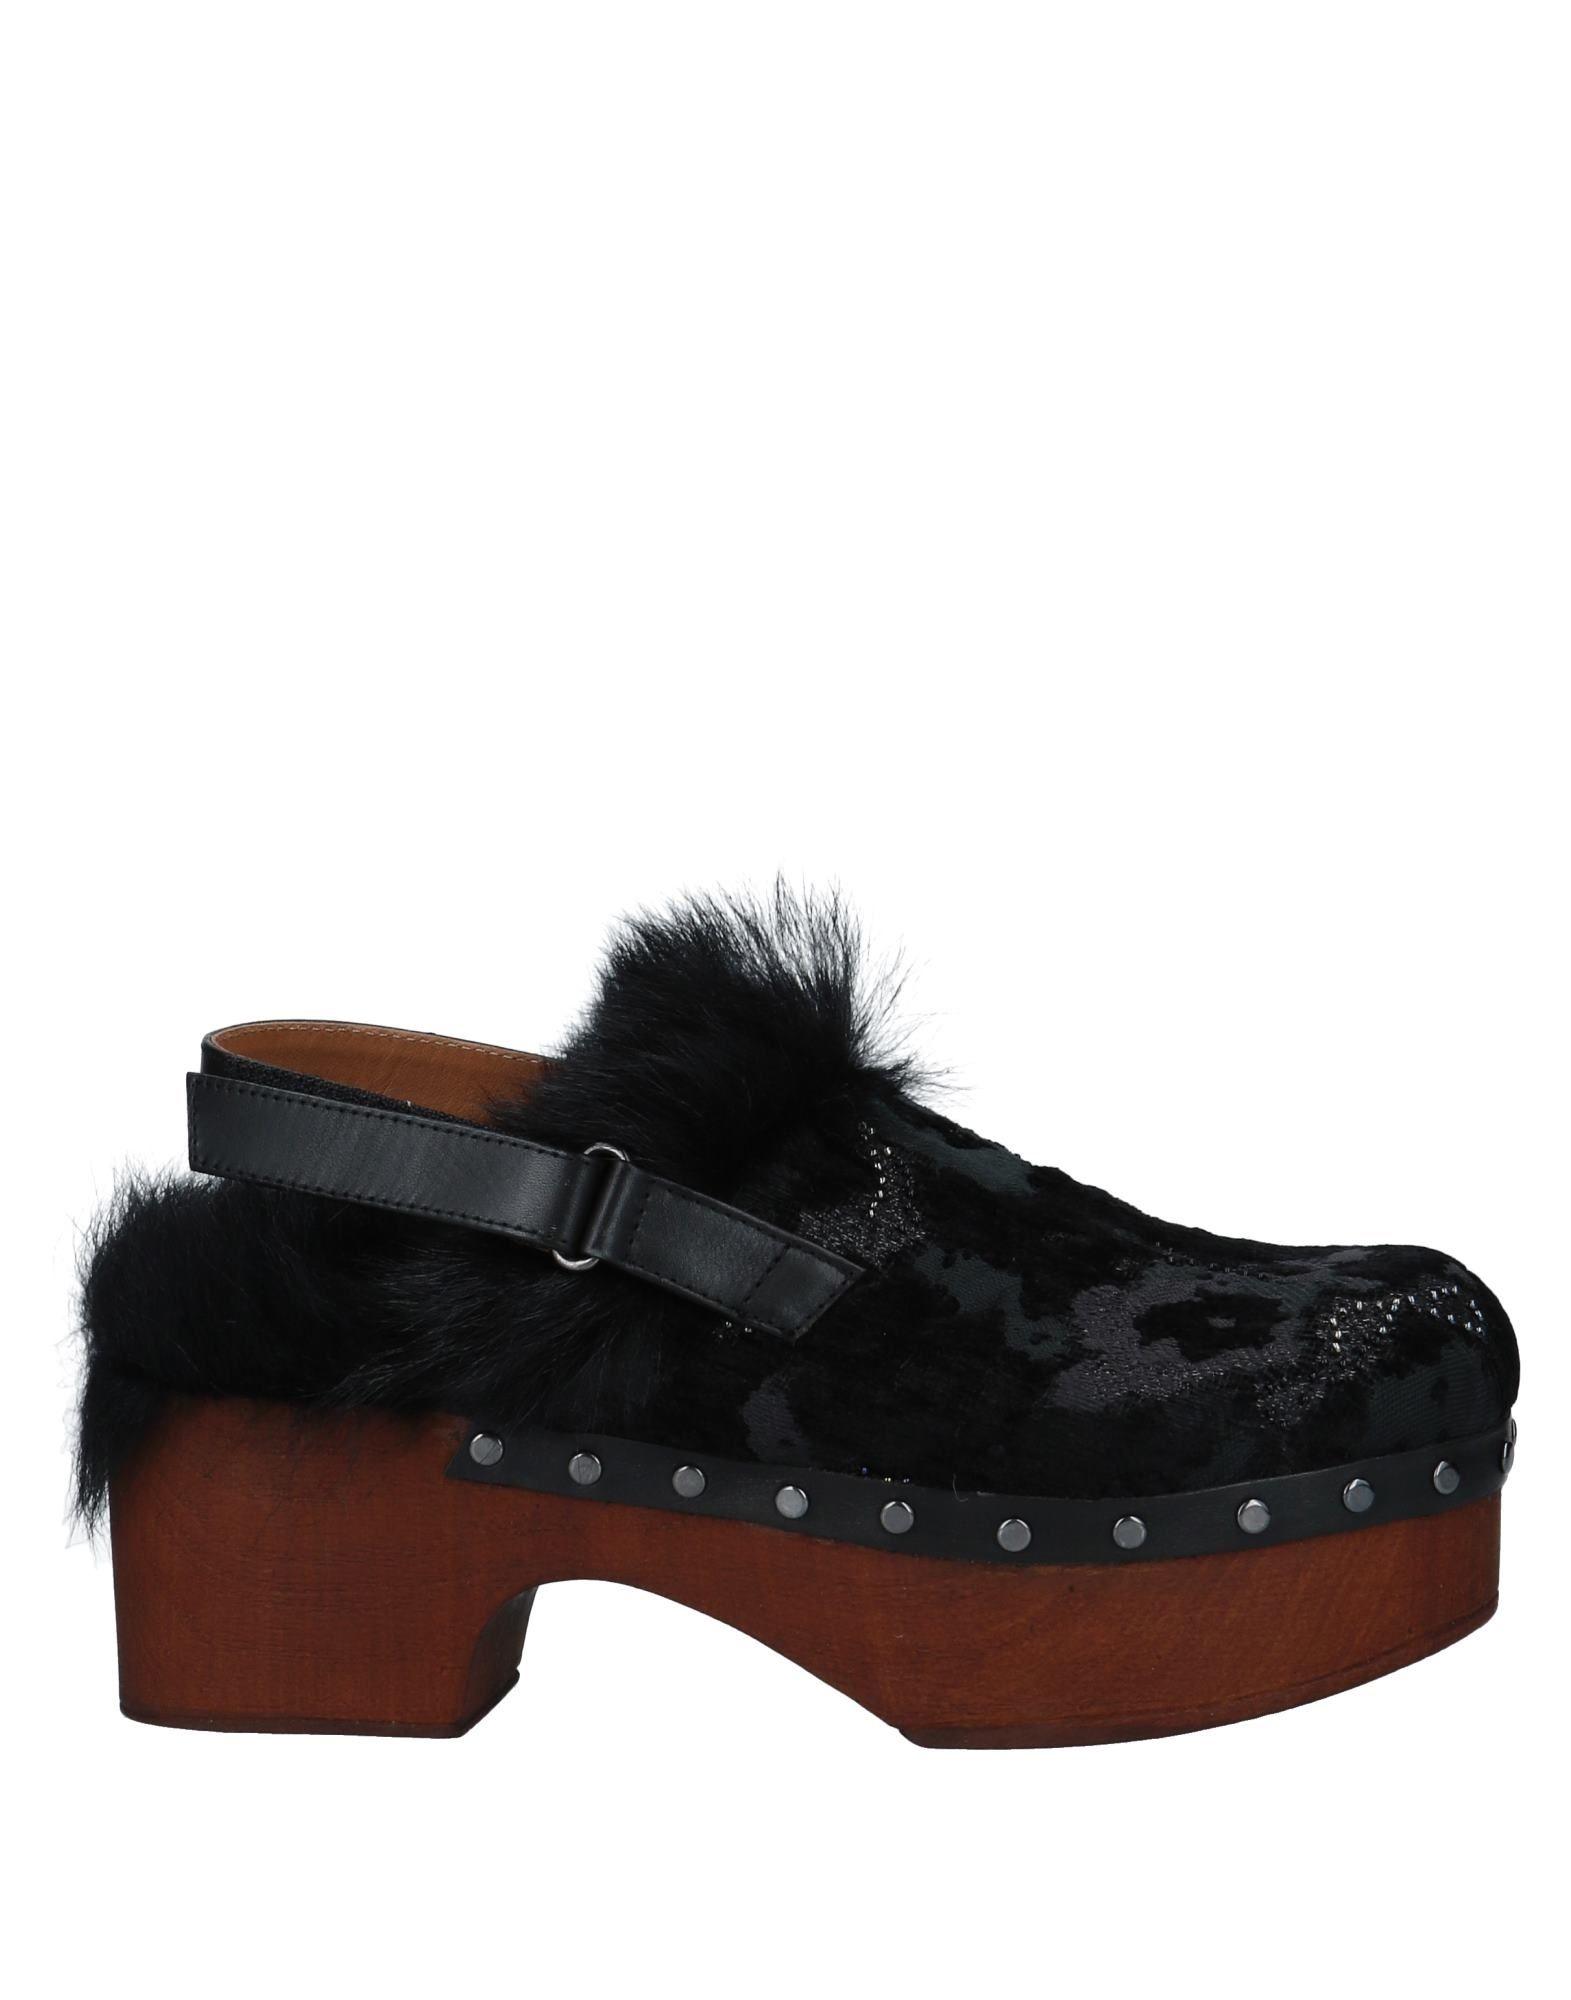 Coral Blue Pantoletten Damen  11550185ON Gute Qualität beliebte Schuhe